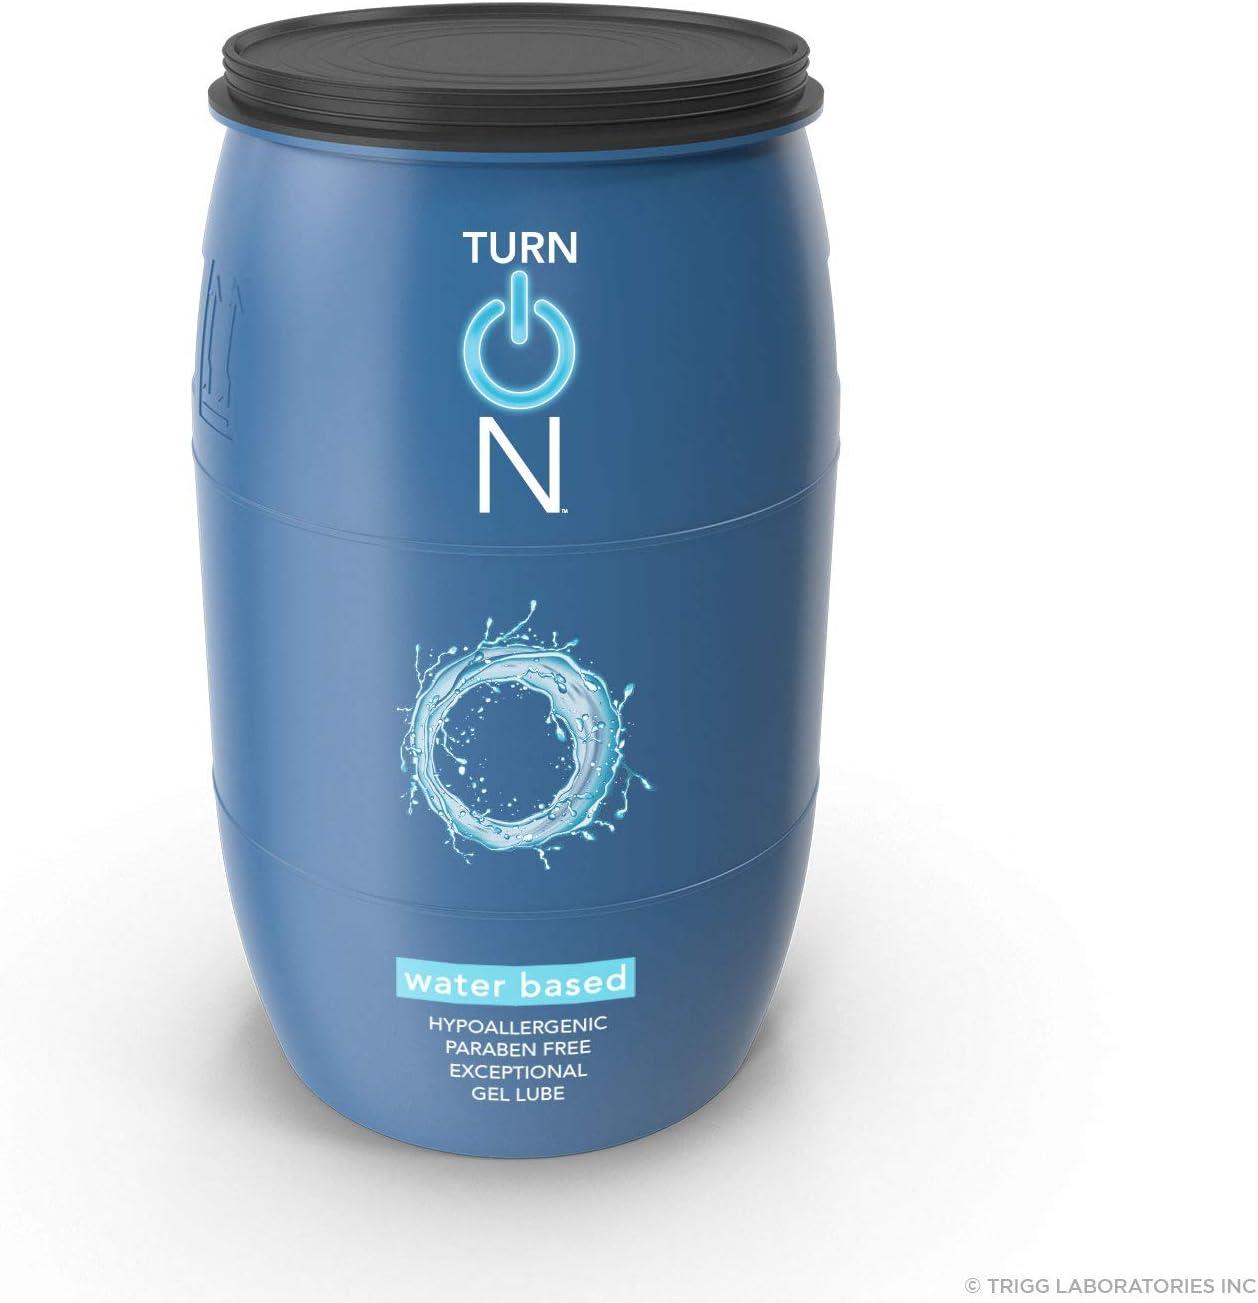 Turn On Water Based Sex Lube Lub Premium 55 Gallon Award Drum Personal 2021 model